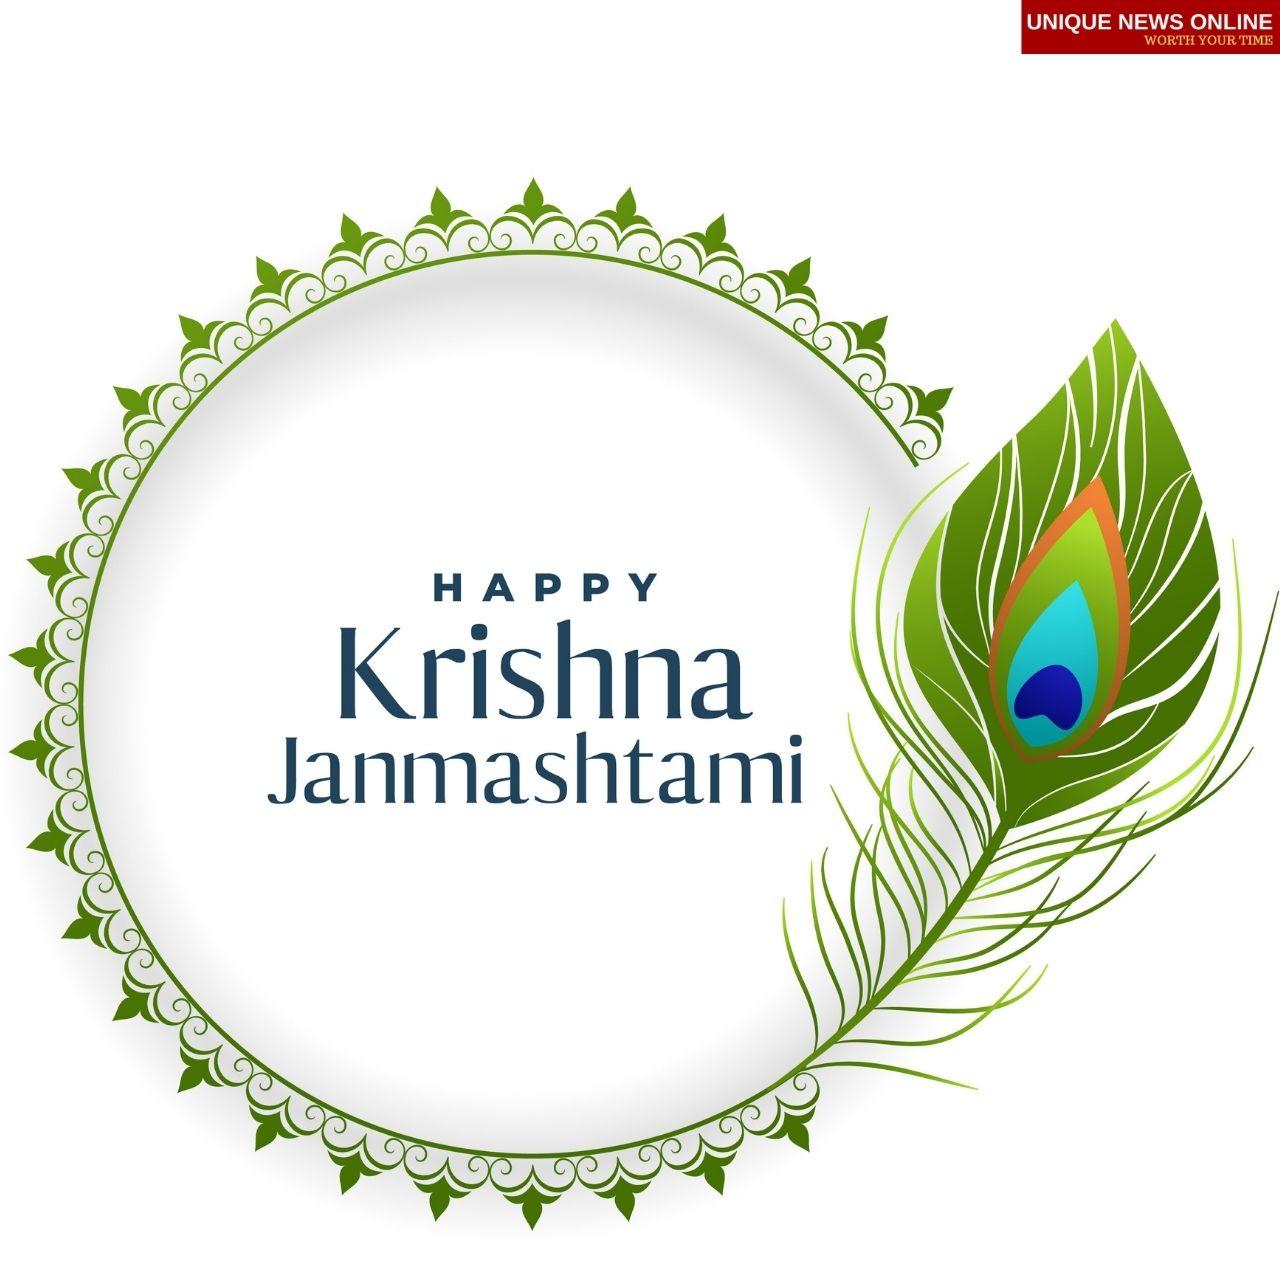 Happy Krishna Janmashtami 2021 WhatsApp Messages, SMS, Meme, GIFs, and Captions for Instagram